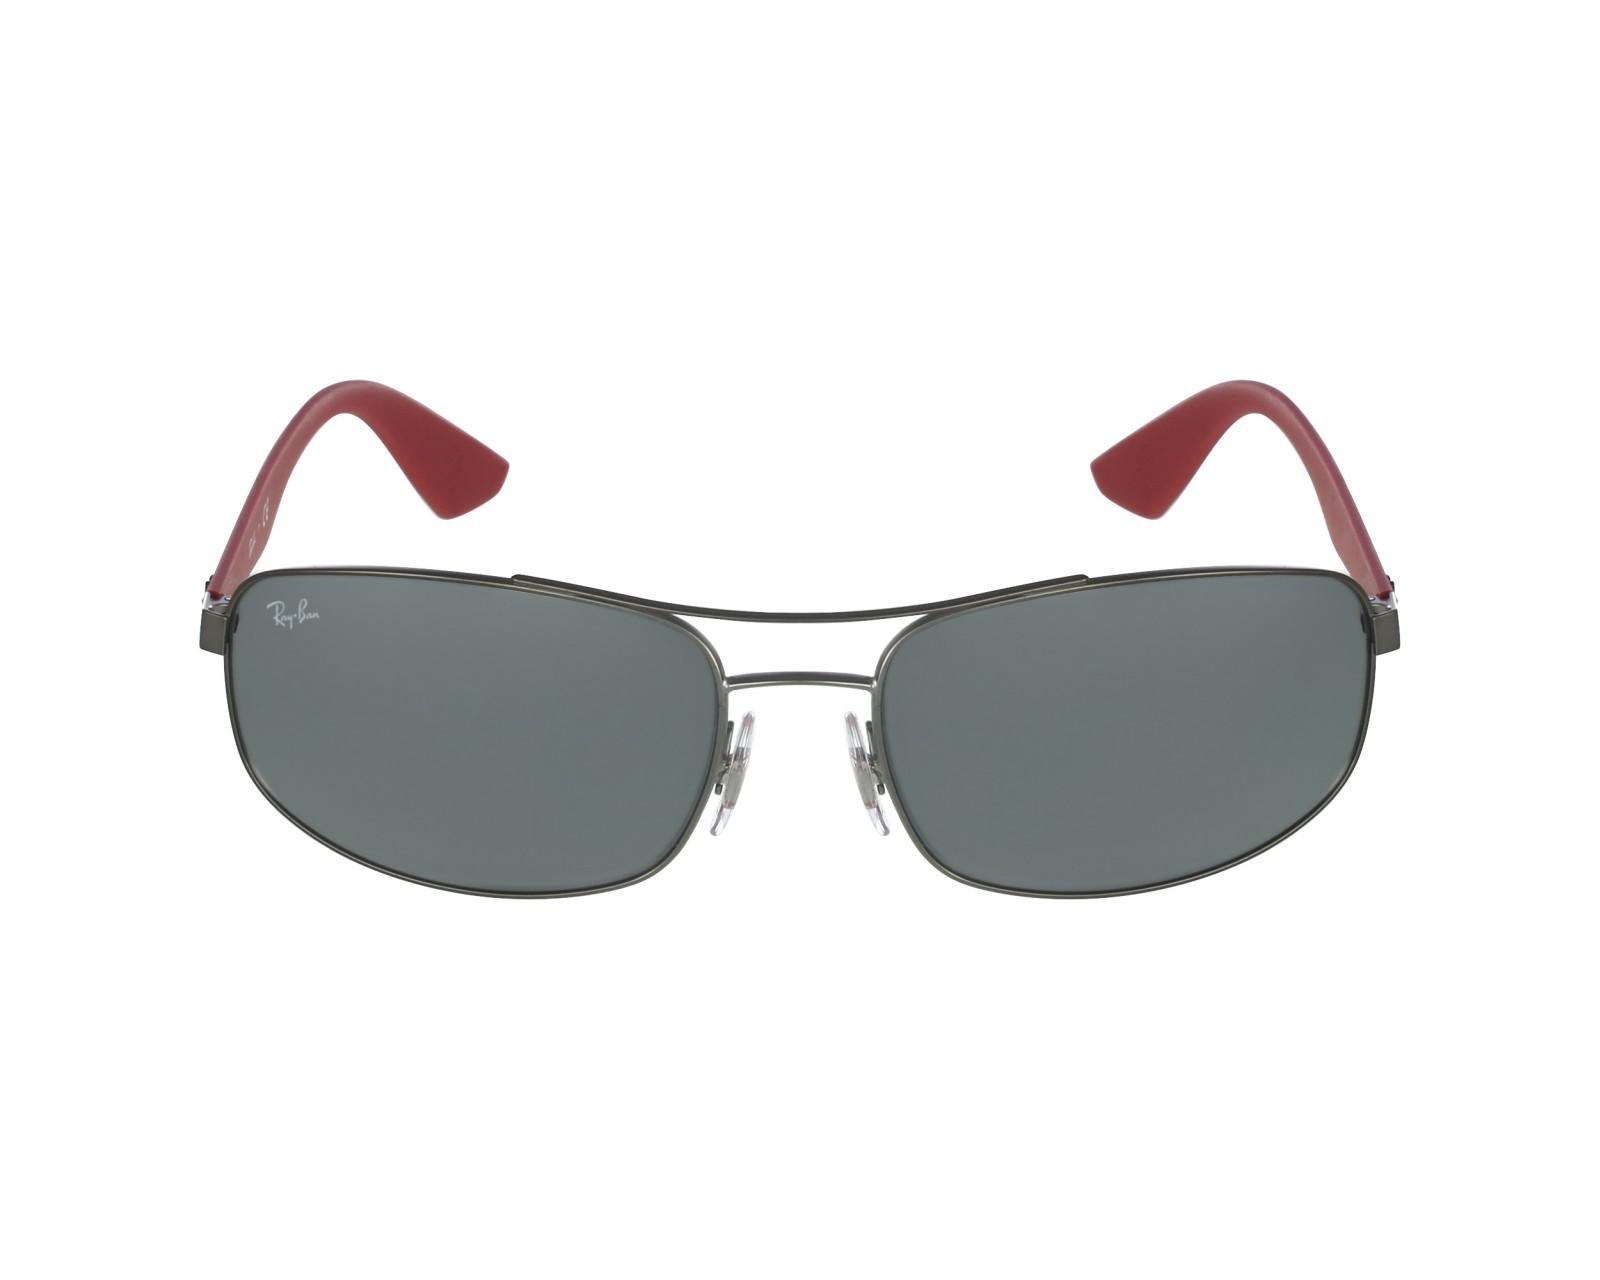 0cb0dc26a33 thumbnail Sunglasses Ray-Ban RB-3527 029 6G - Gun Red profile view